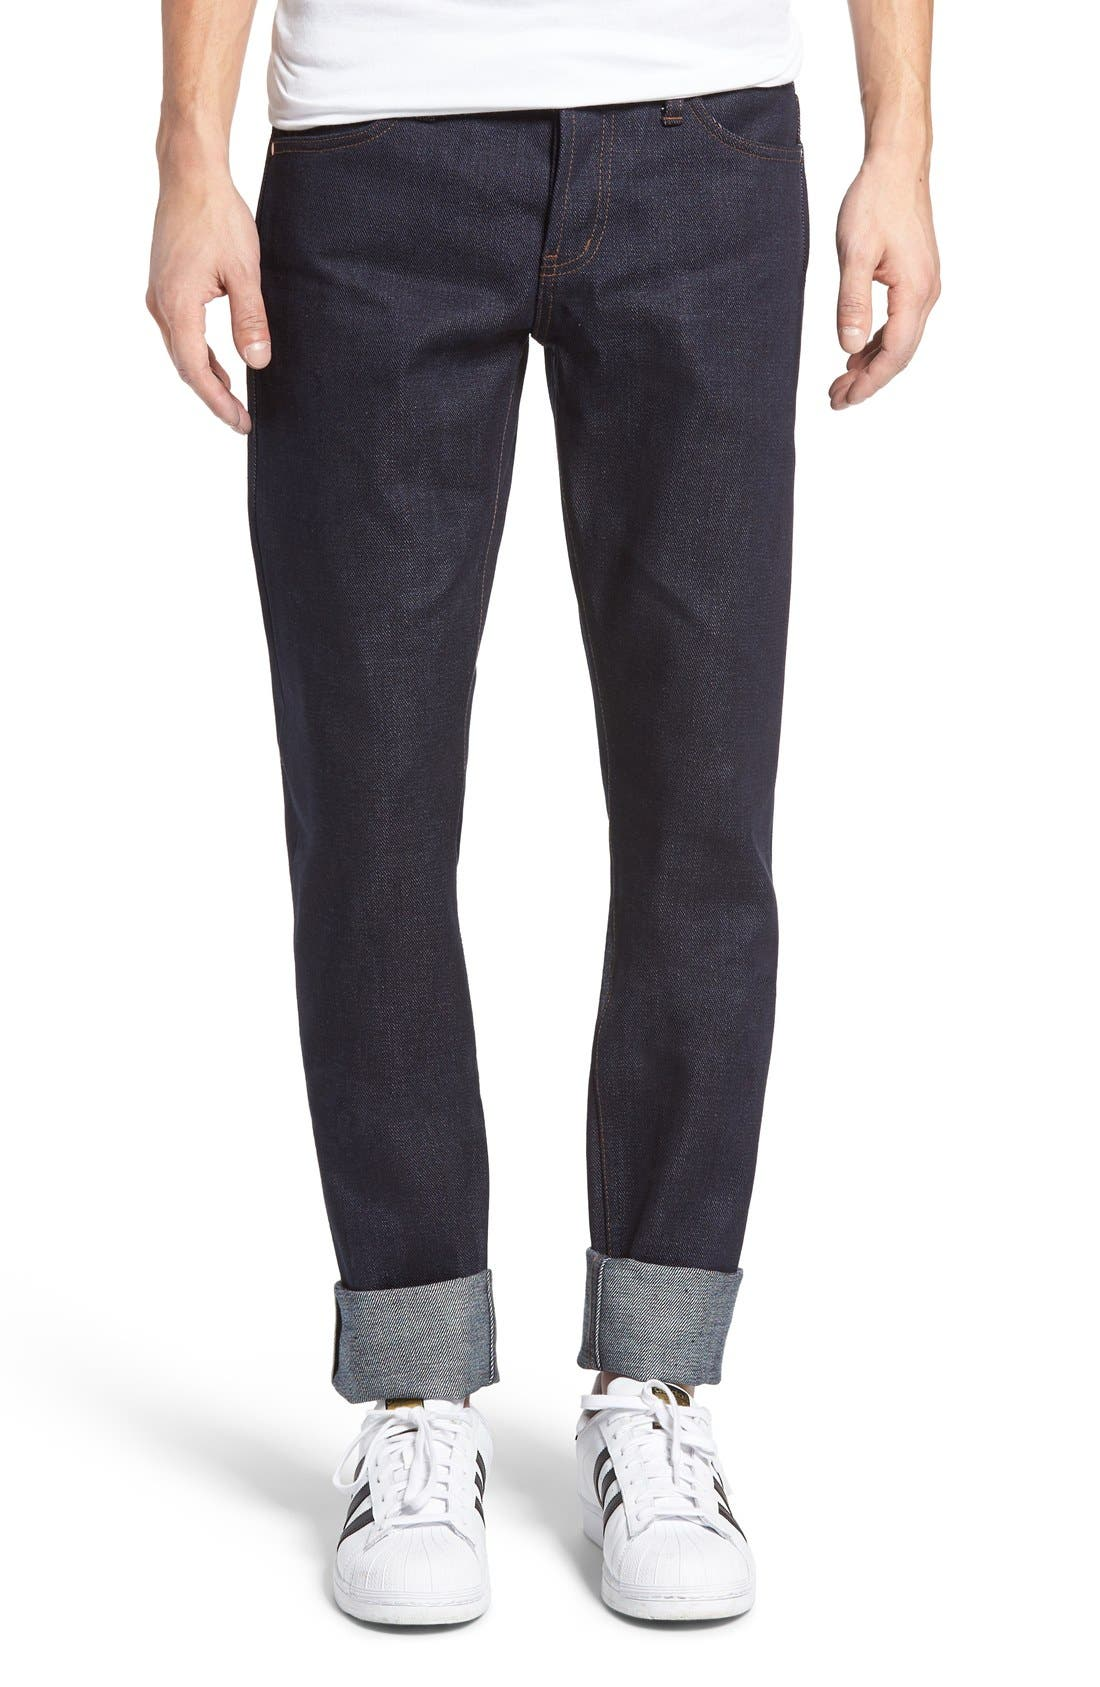 UB121 Selvedge Skinny Fit Jeans,                             Main thumbnail 1, color,                             401